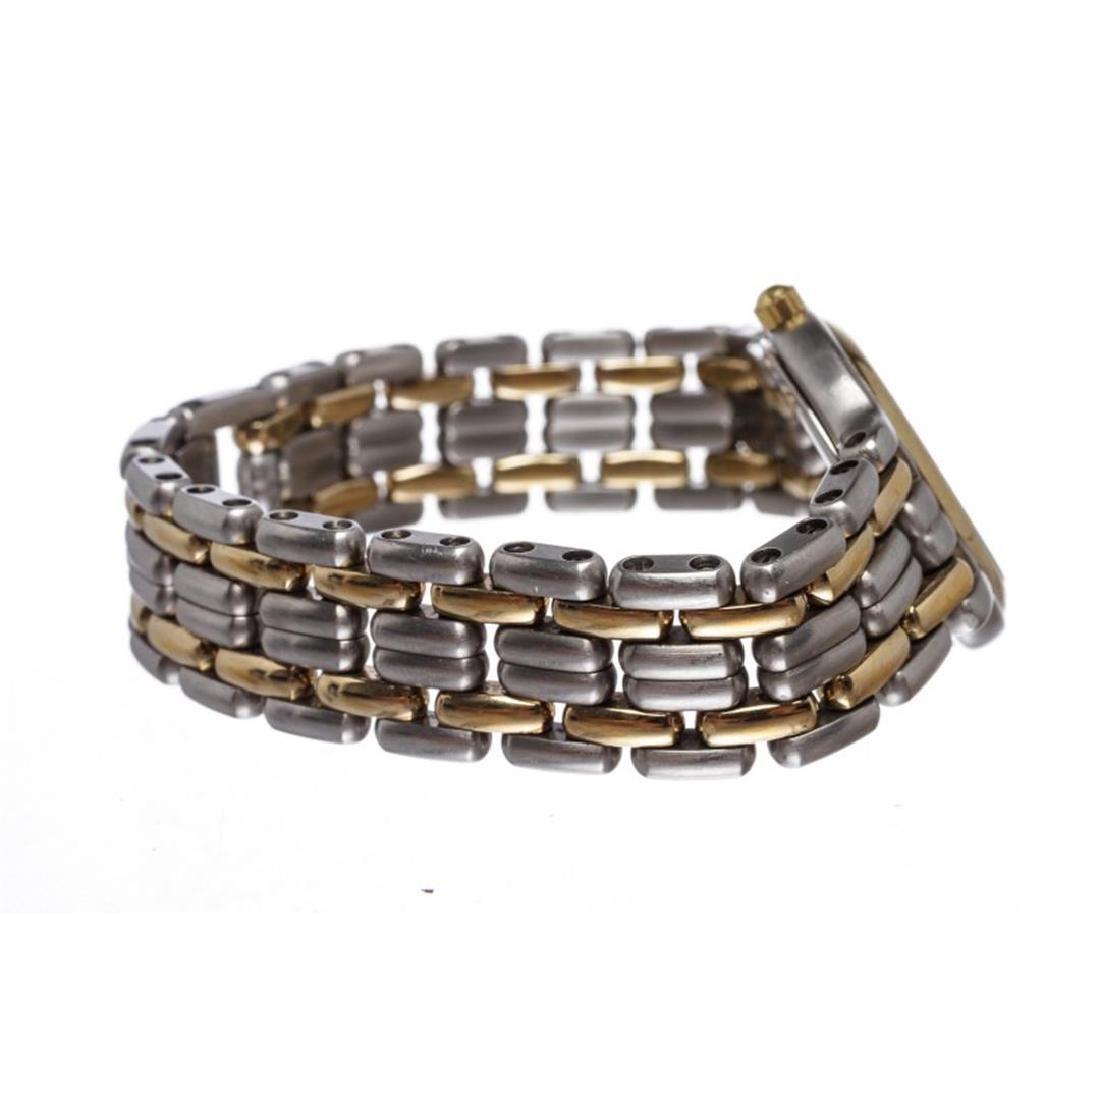 Raymond Weil Geneve Quartz Stainless Steel Wristwatch - 3